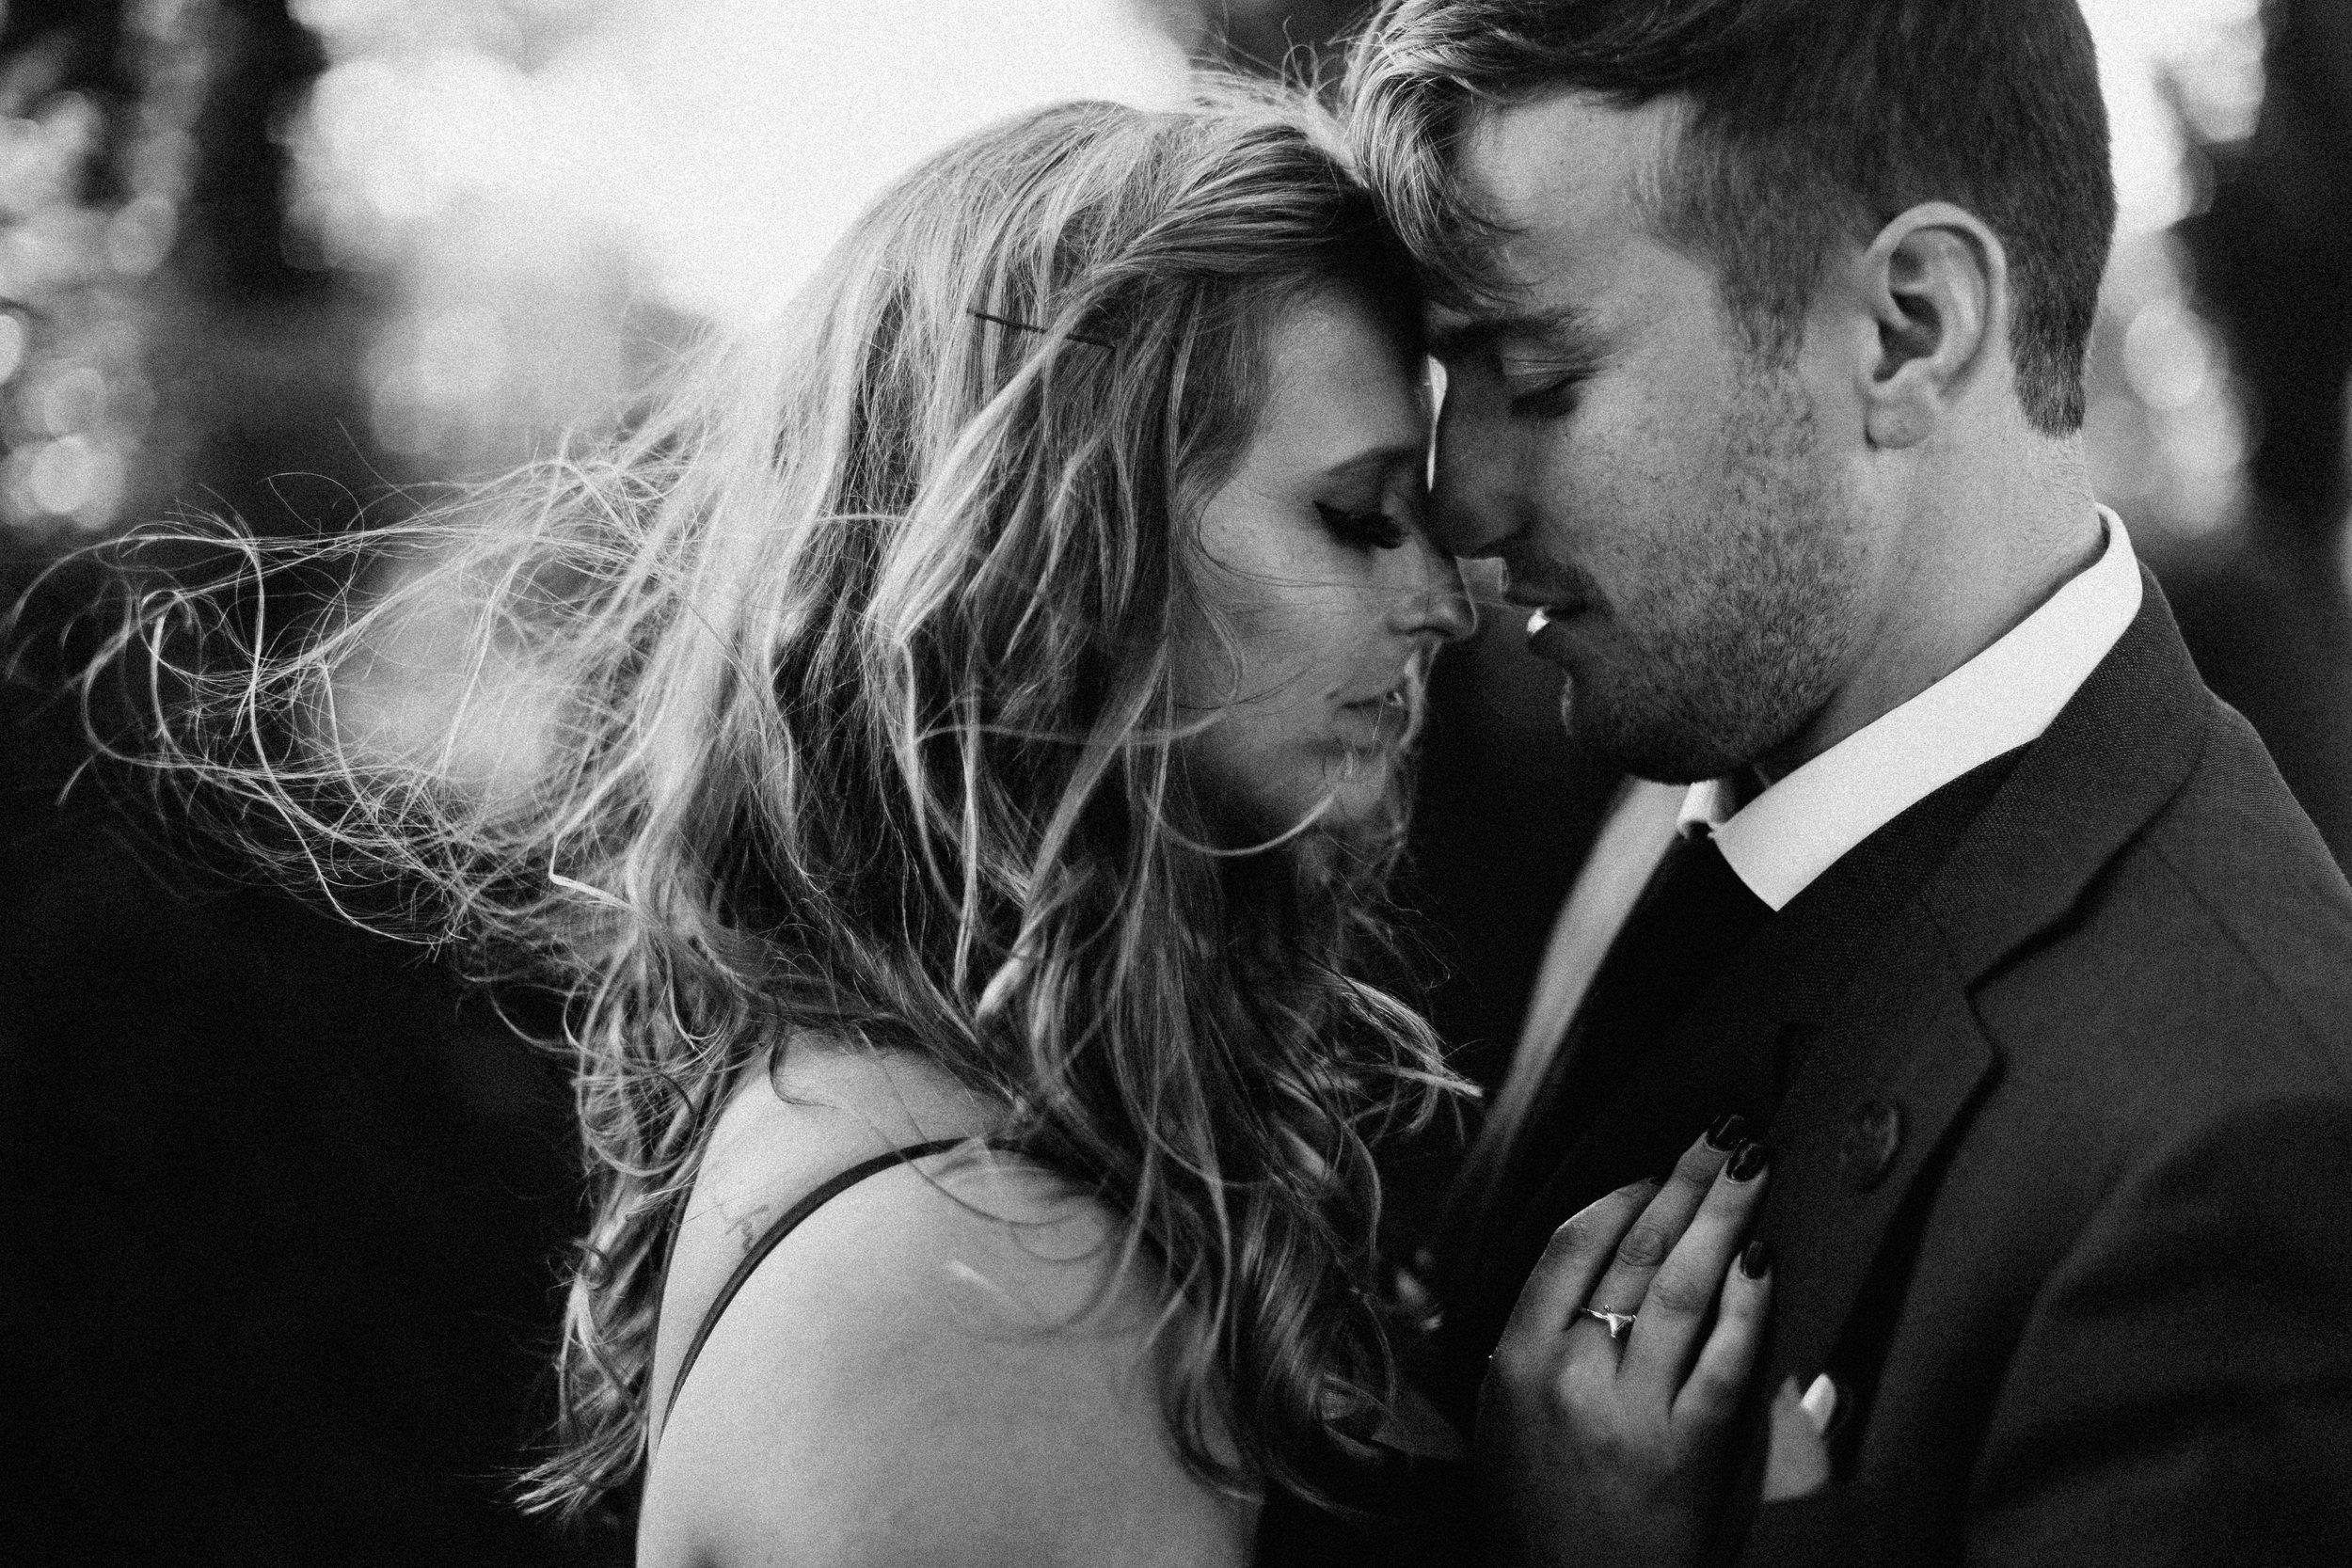 ireland_elopement_black_wedding_dress_wicklow_glendalough_athy_st_kevins_way_1710.jpg